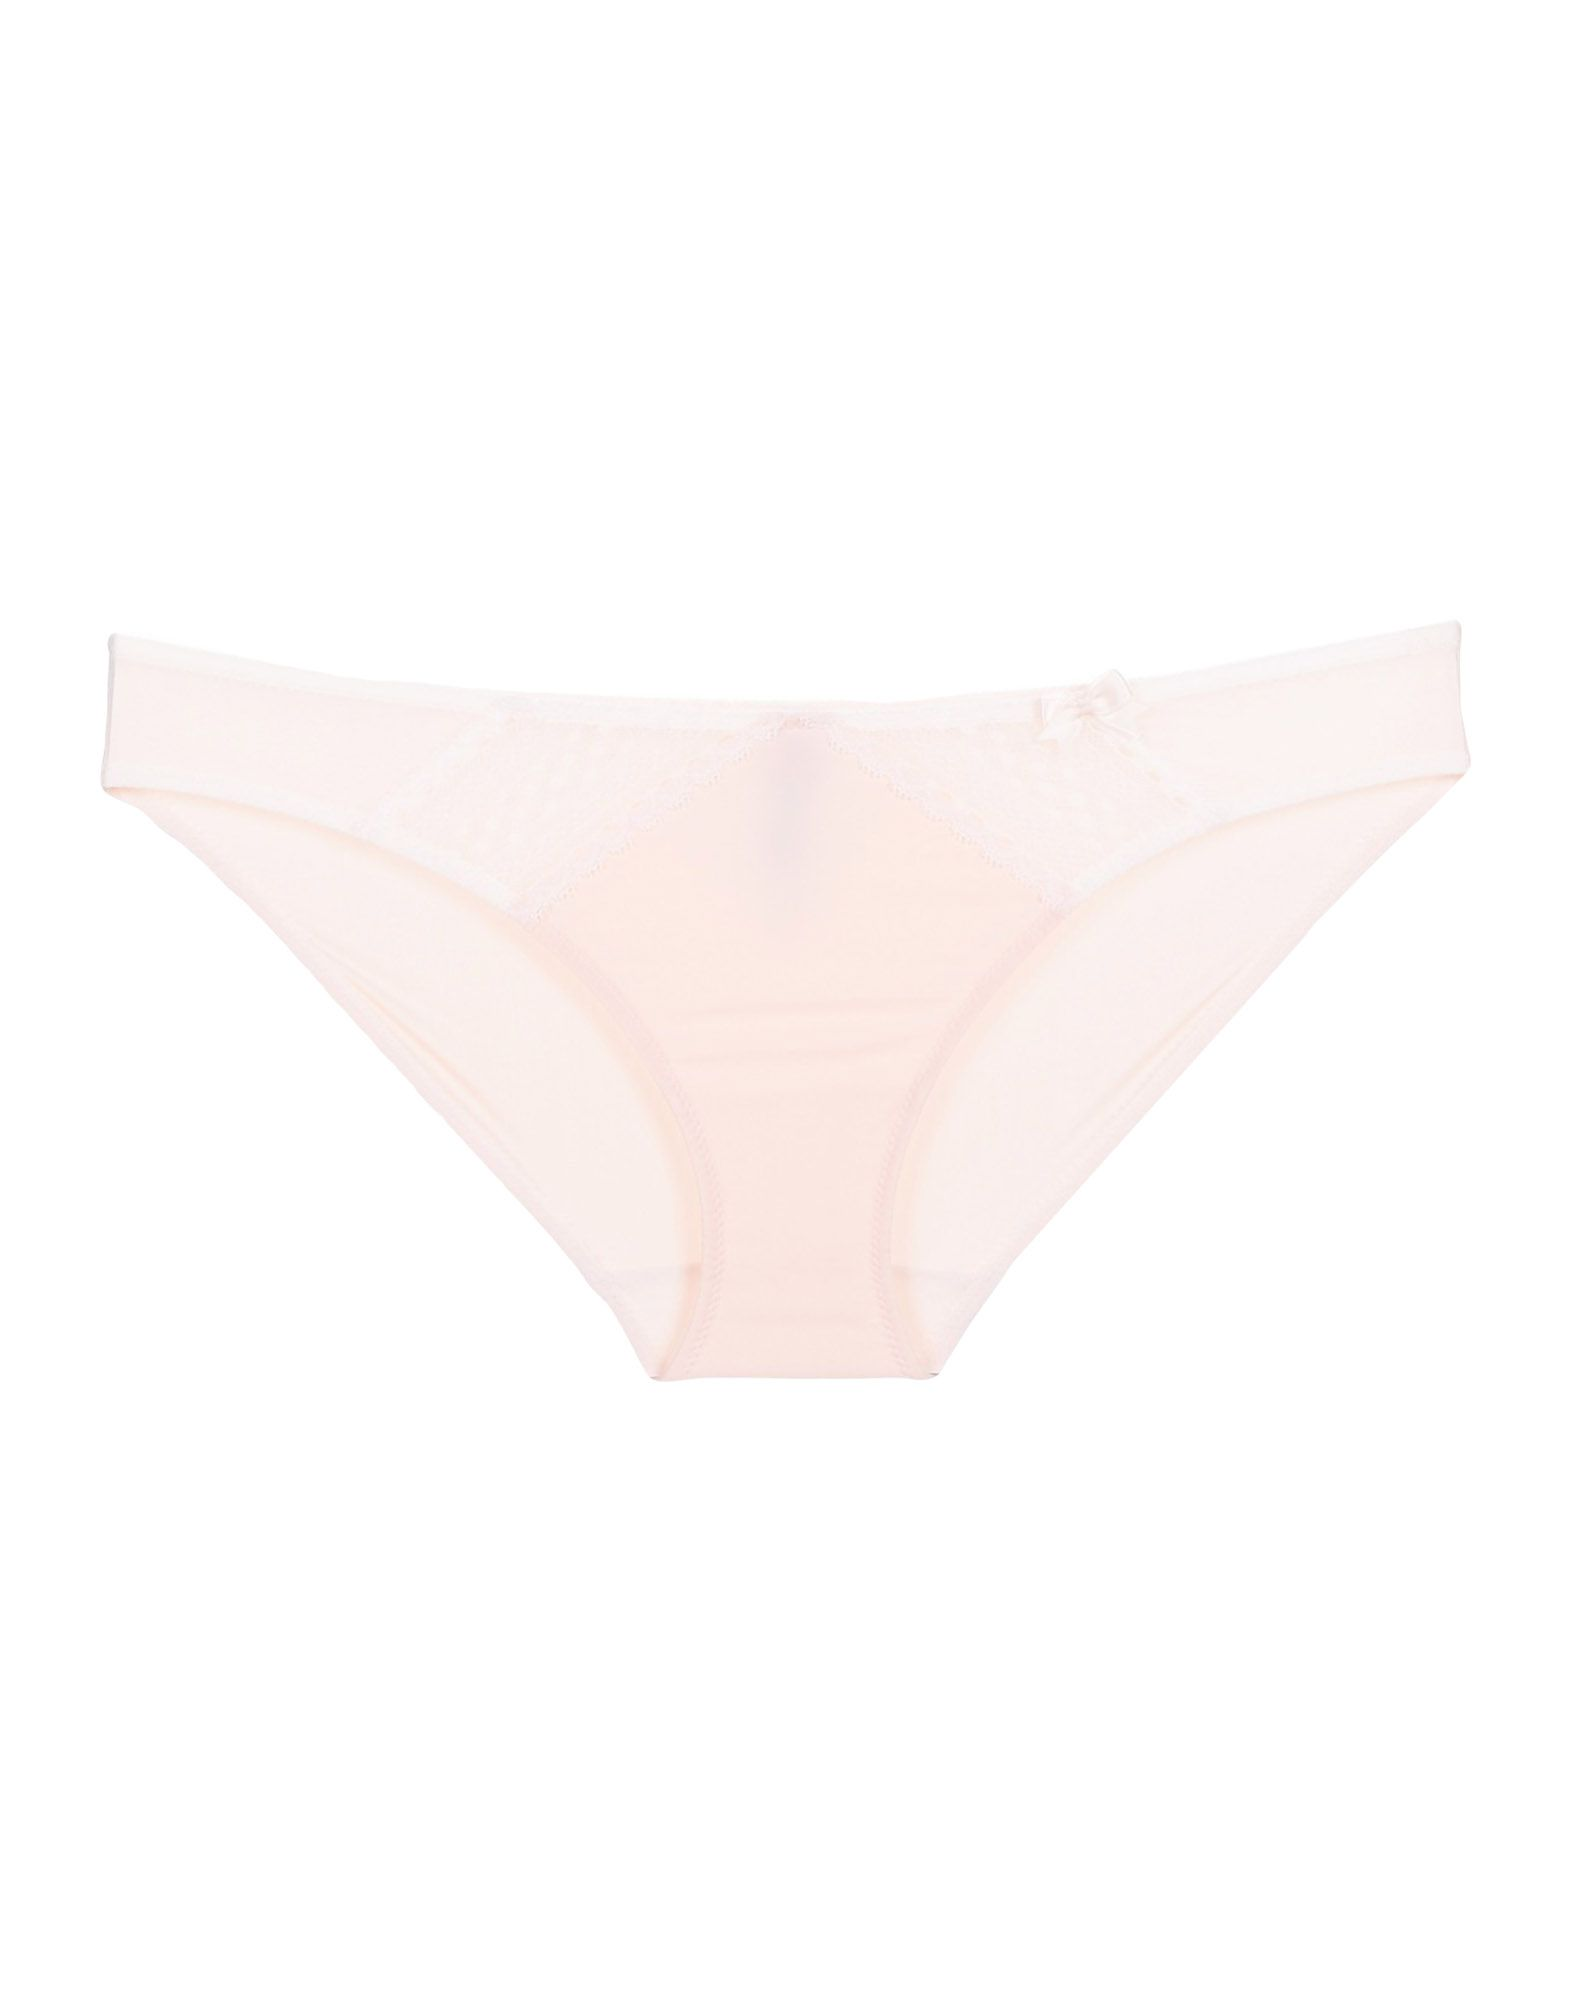 ФОТО passionata lingerie Трусы